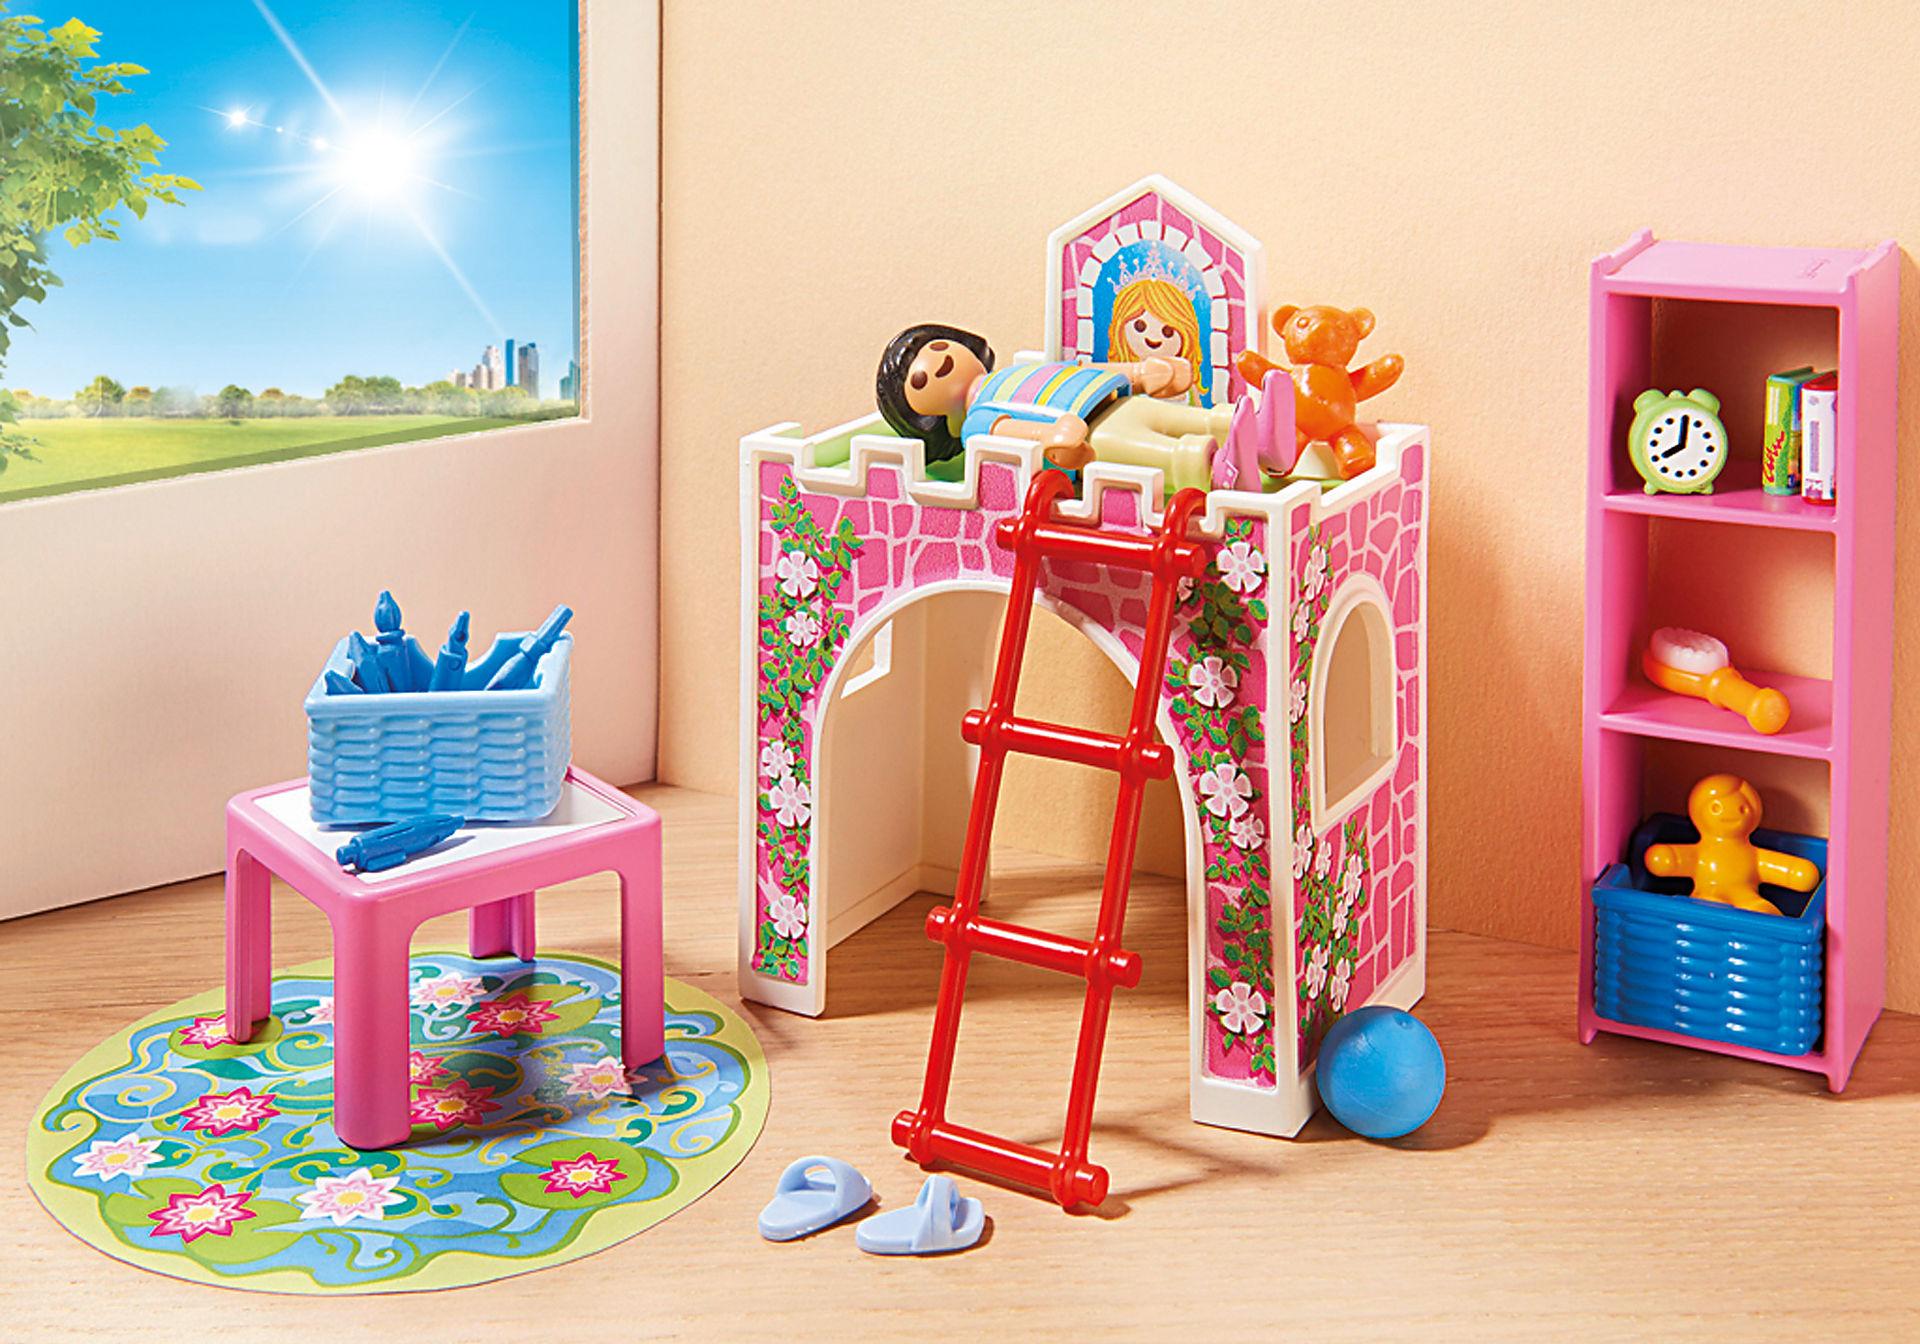 http://media.playmobil.com/i/playmobil/9270_product_extra1/Muntert børneværelse